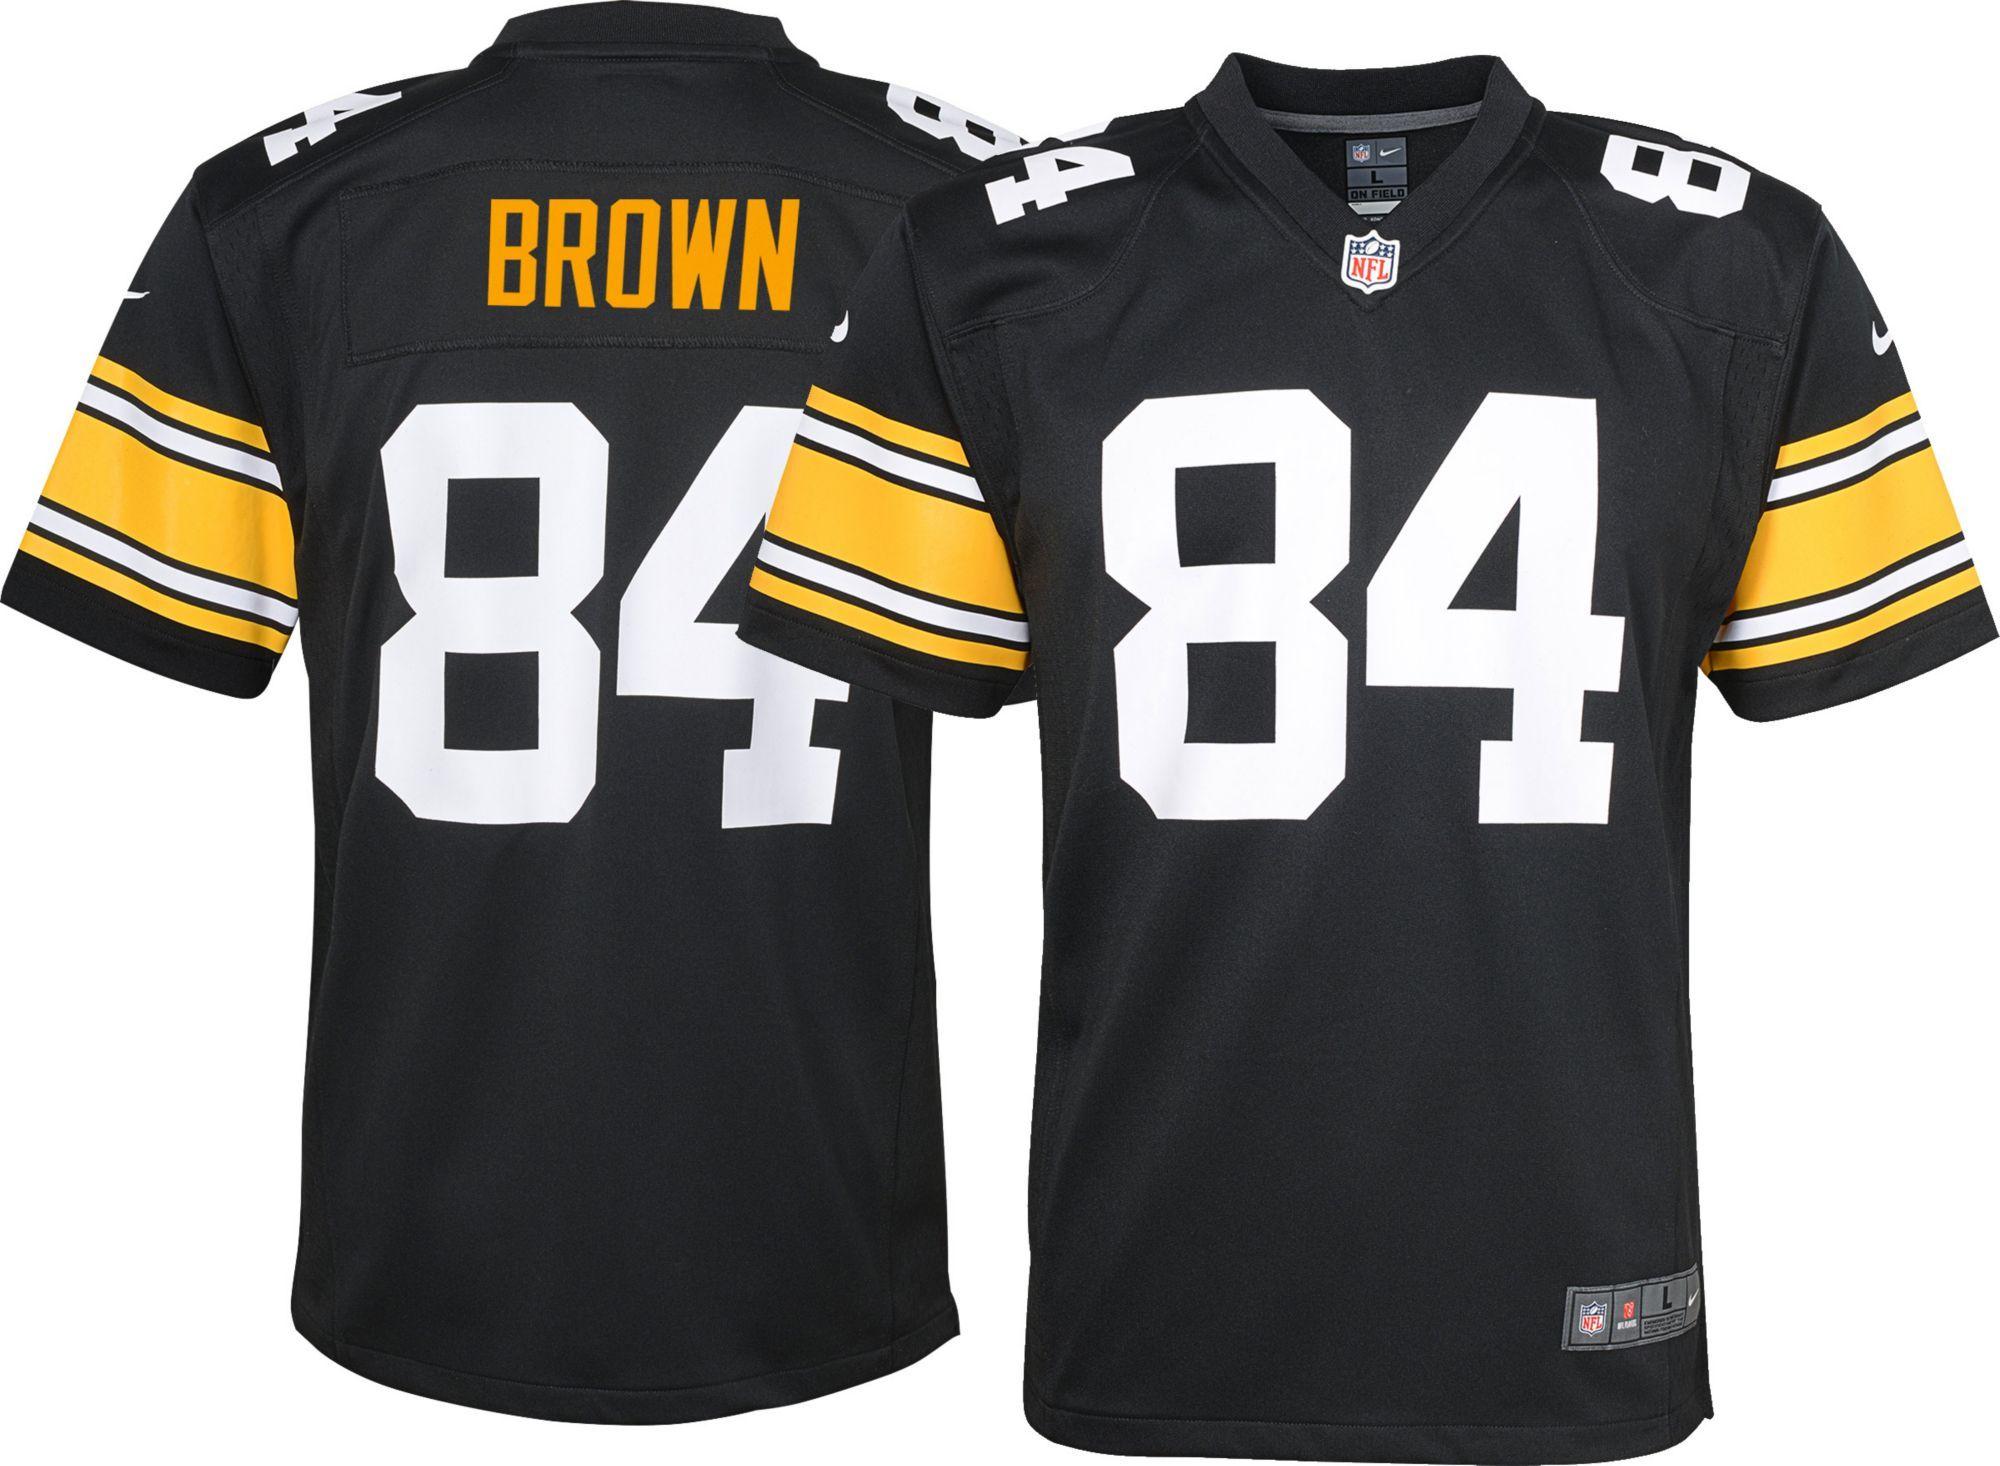 Nike Youth Alternate Game Jersey Pittsburgh Antonio Brown 84 Black Jersey Antonio Brown Steelers Antonio Brown